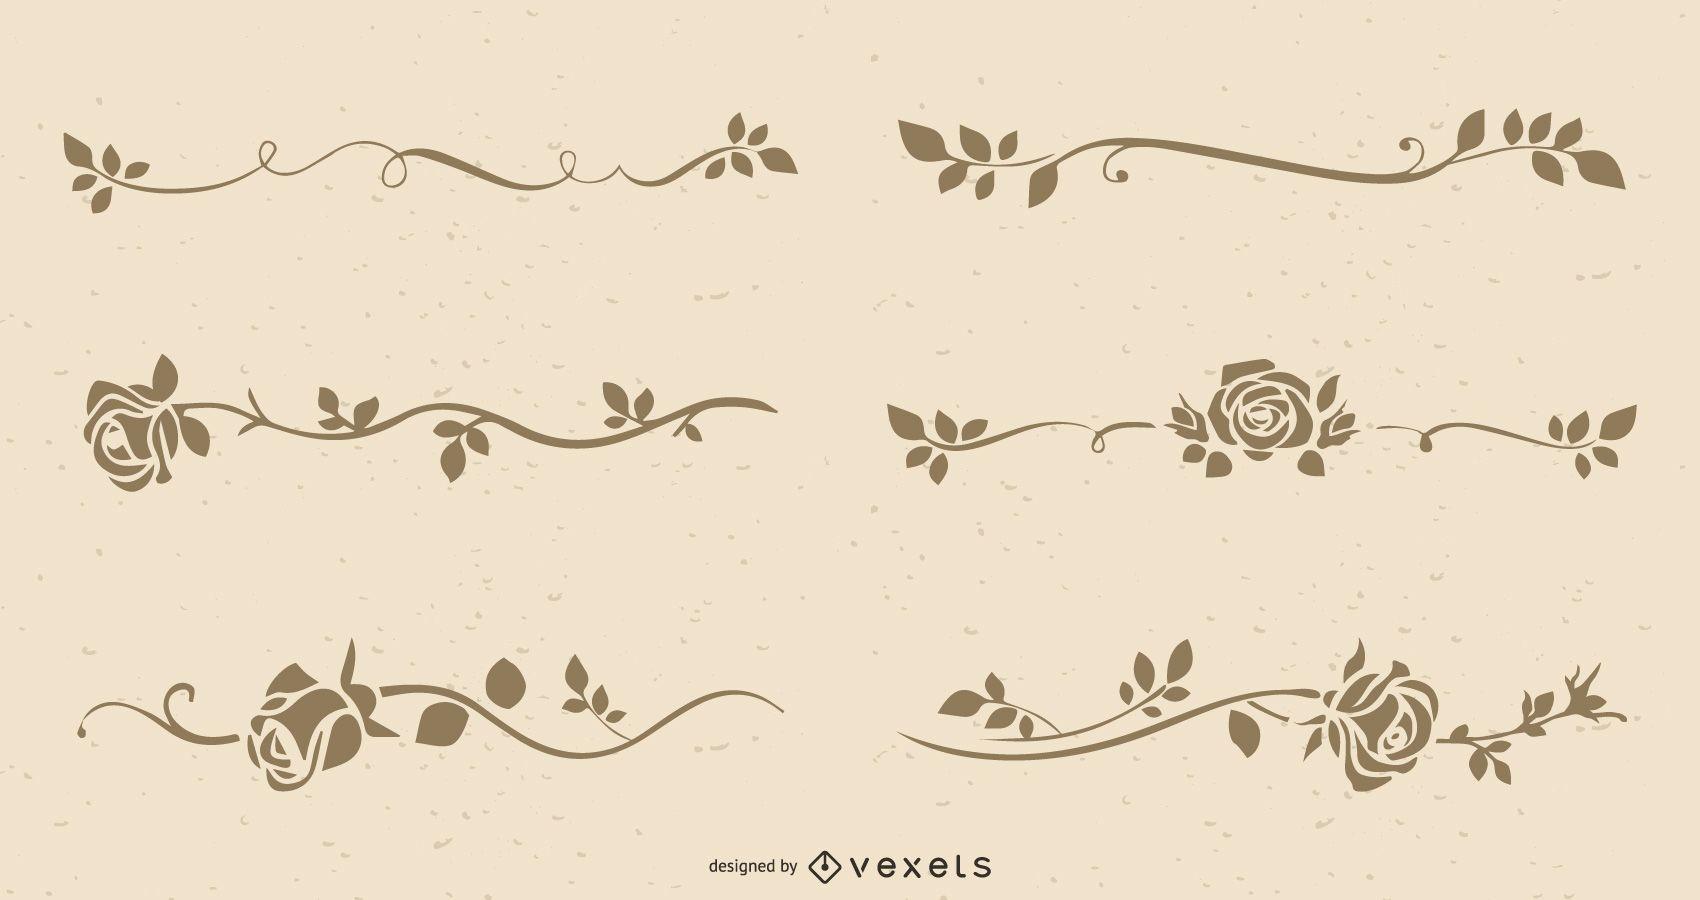 The Retro Line Art Roses Vector